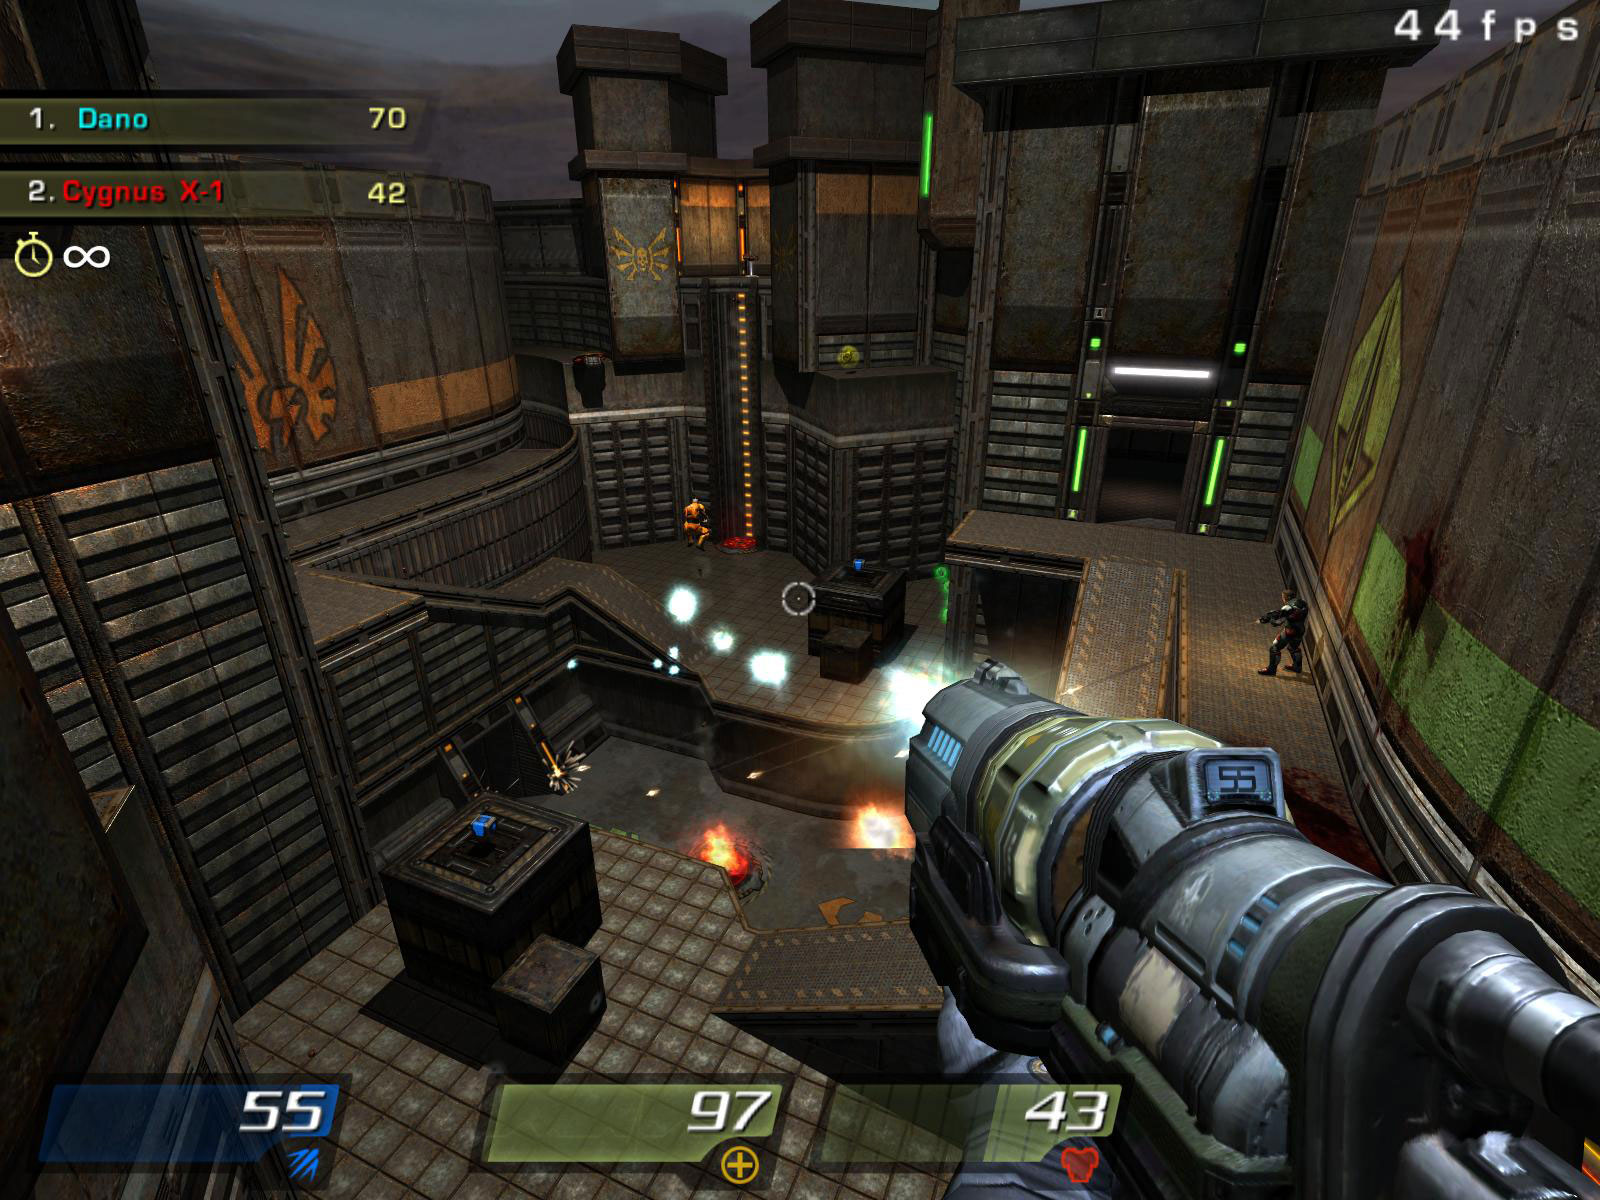 Free Download Pc Games Alien Shooter V1 2 Full Version